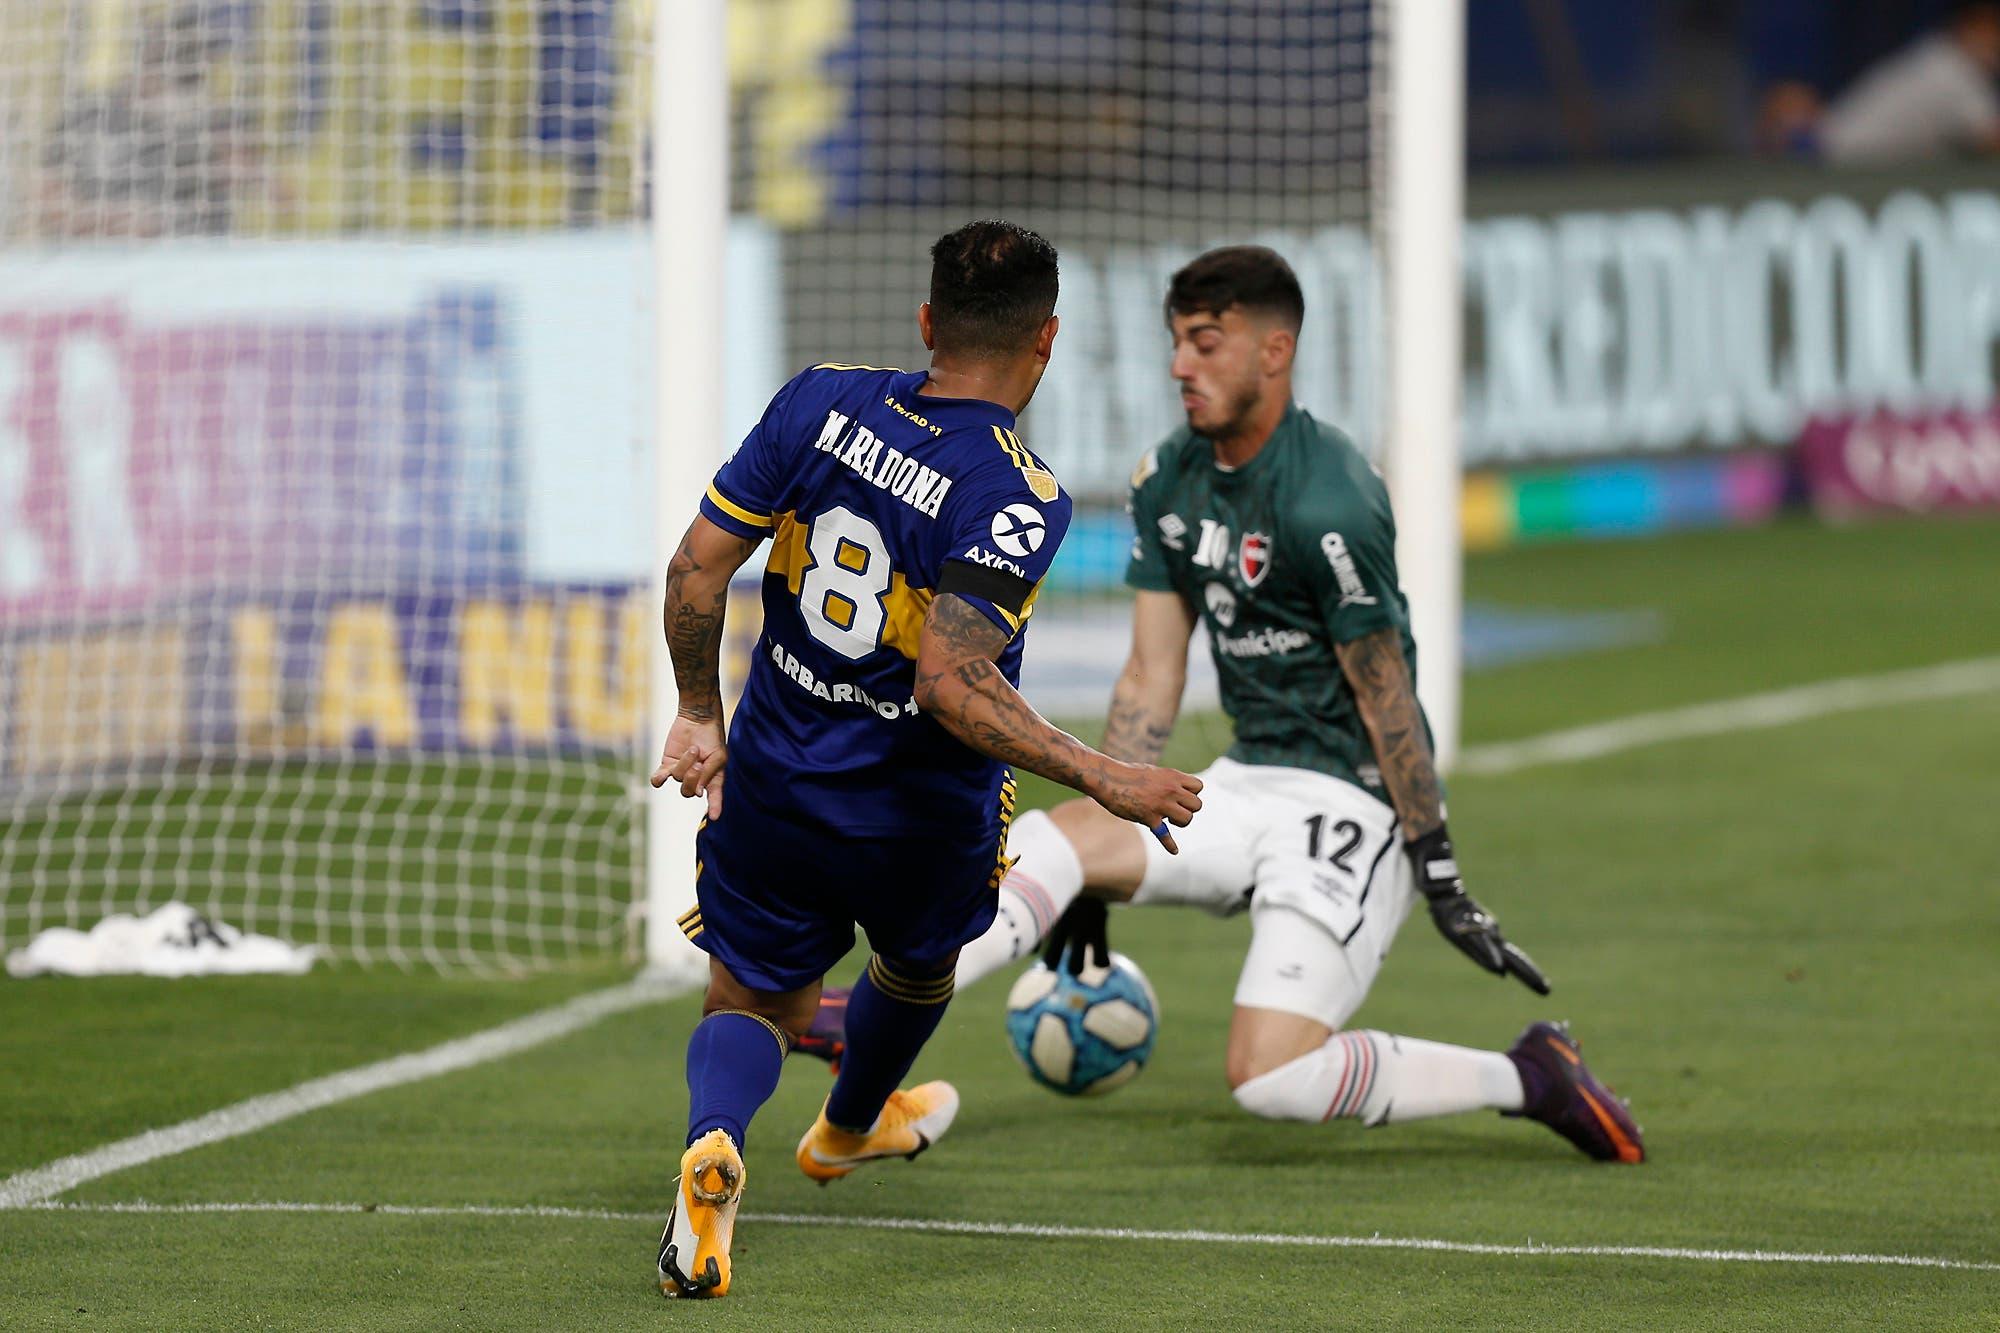 Boca-Newell's Old Boys, por la Copa Diego Maradona: un duelo decisivo en la Bombonera